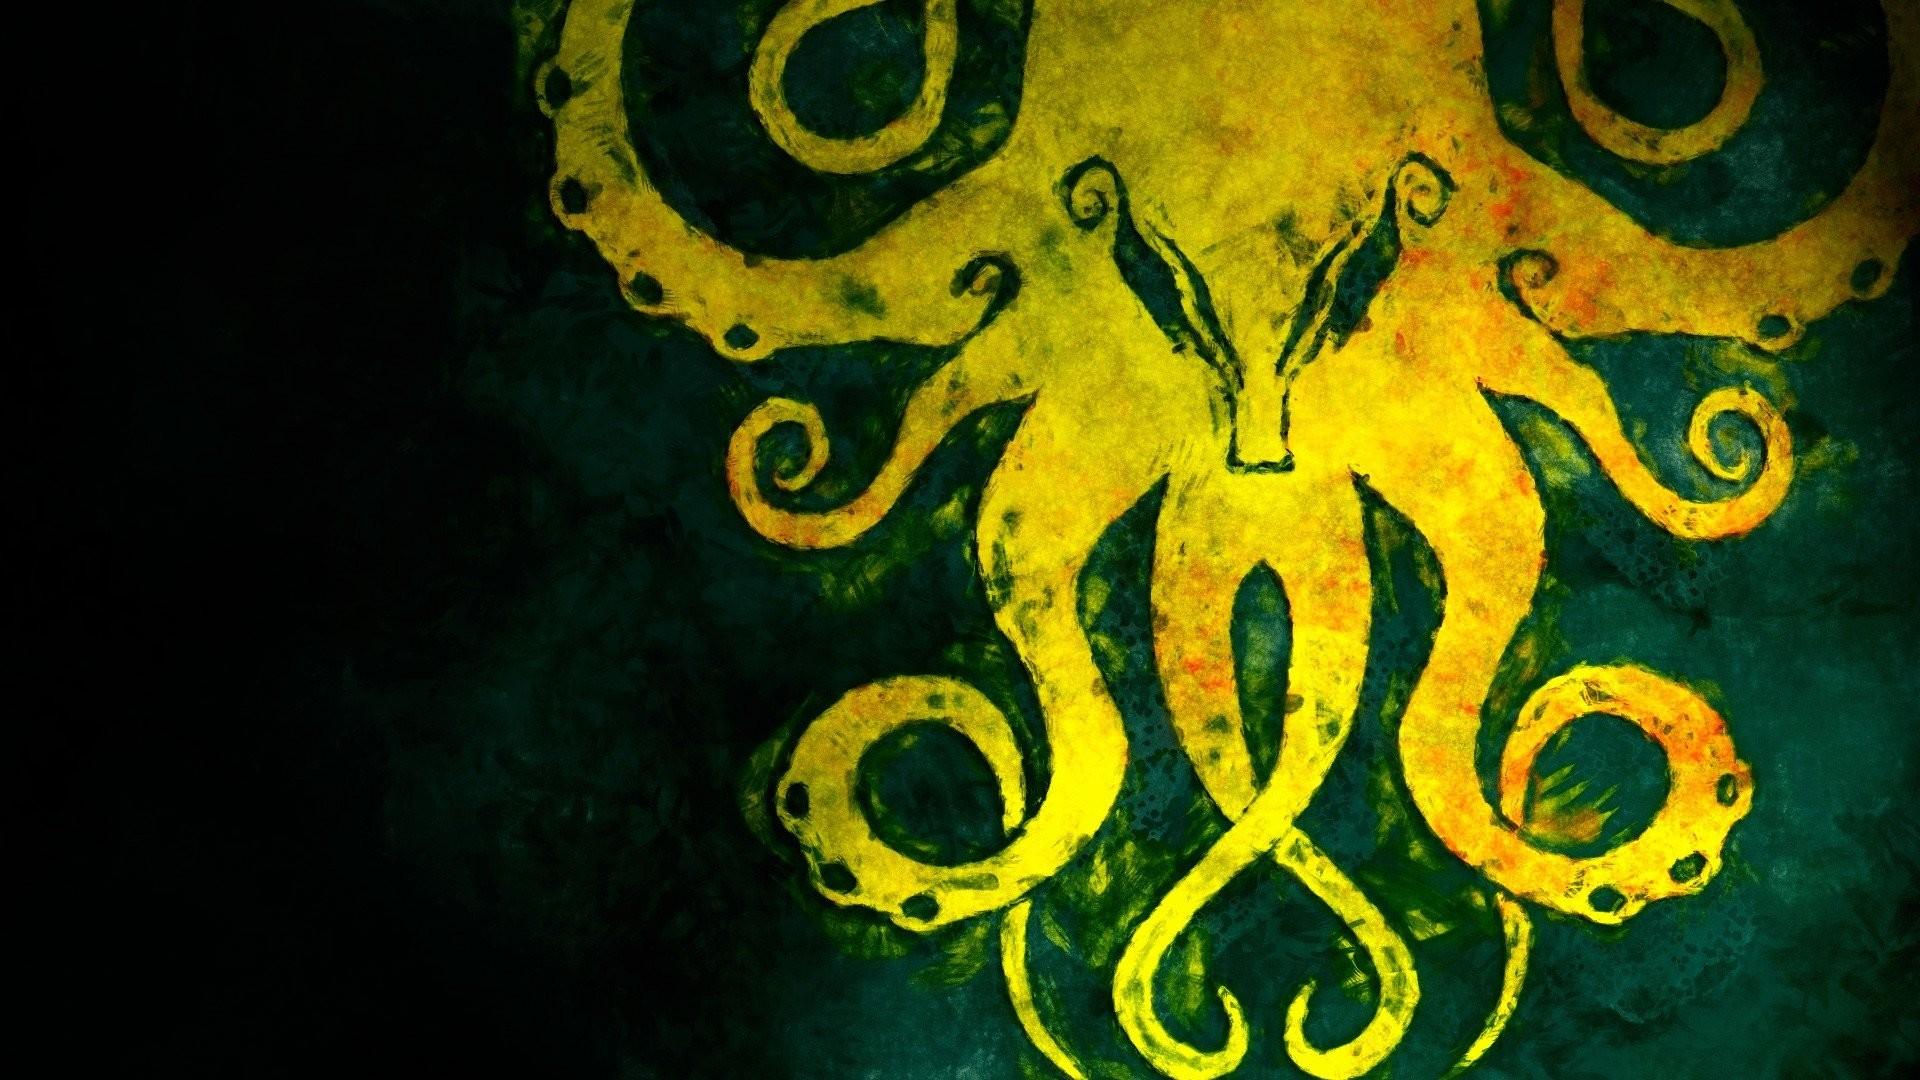 ships-game-of-thrones-house-greyjoy-wallpaper-1.